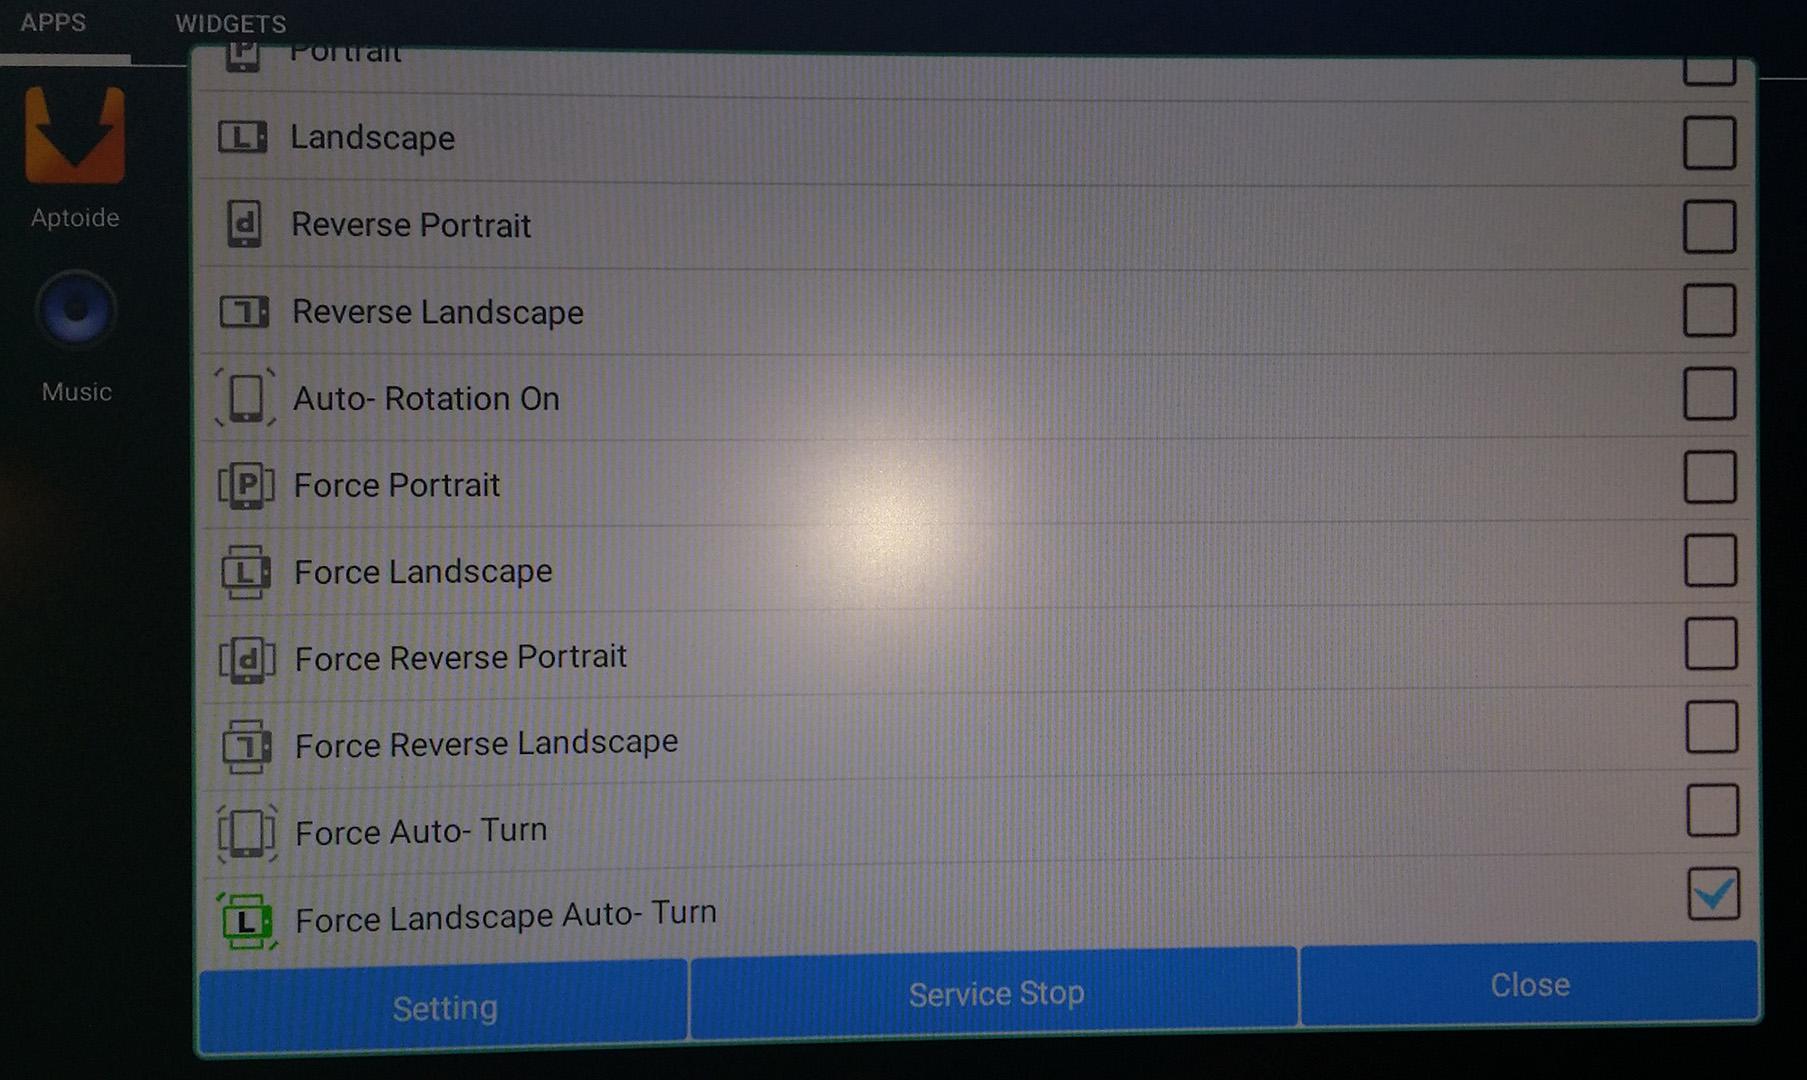 Run Android 5 1 Lollipop Exton build 2 on Raspberry Pi 2 – version